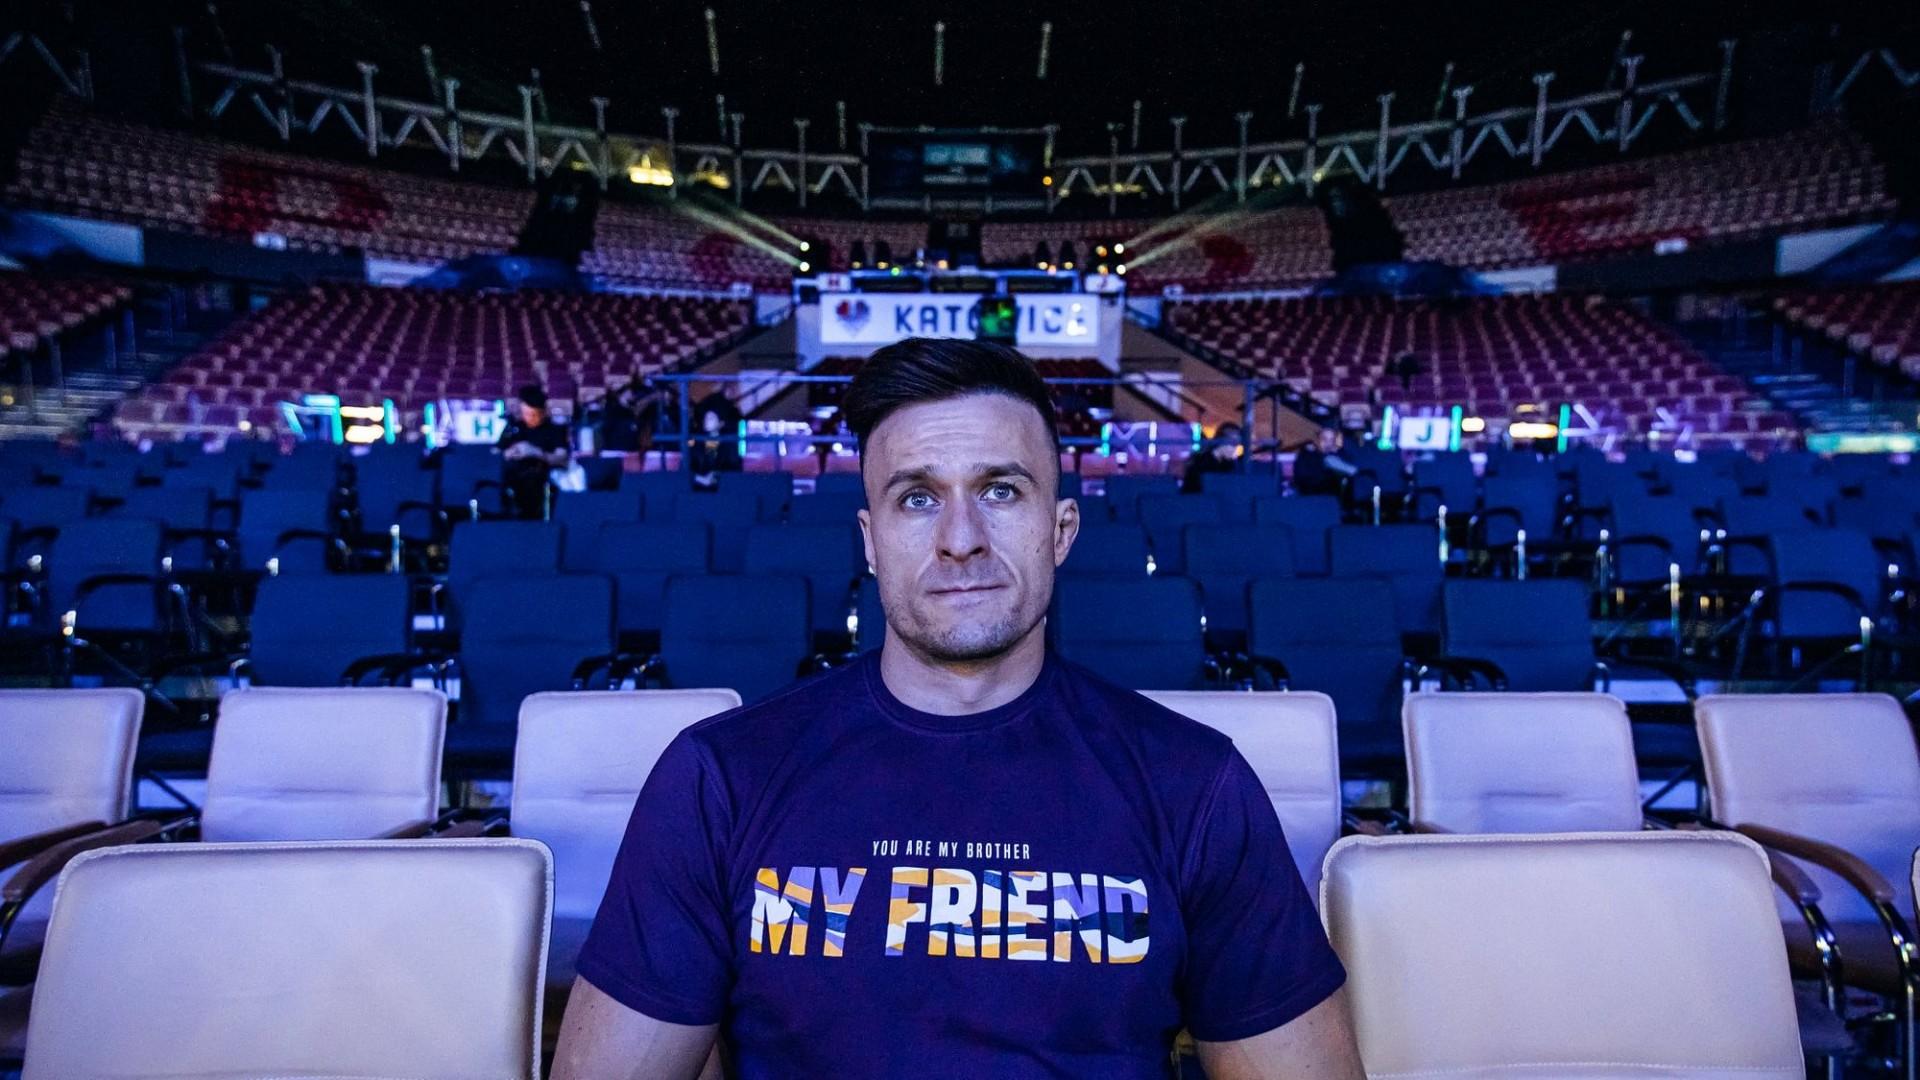 Турнир Intel Extreme Masters XIV в Катовице пройдёт без зрителей